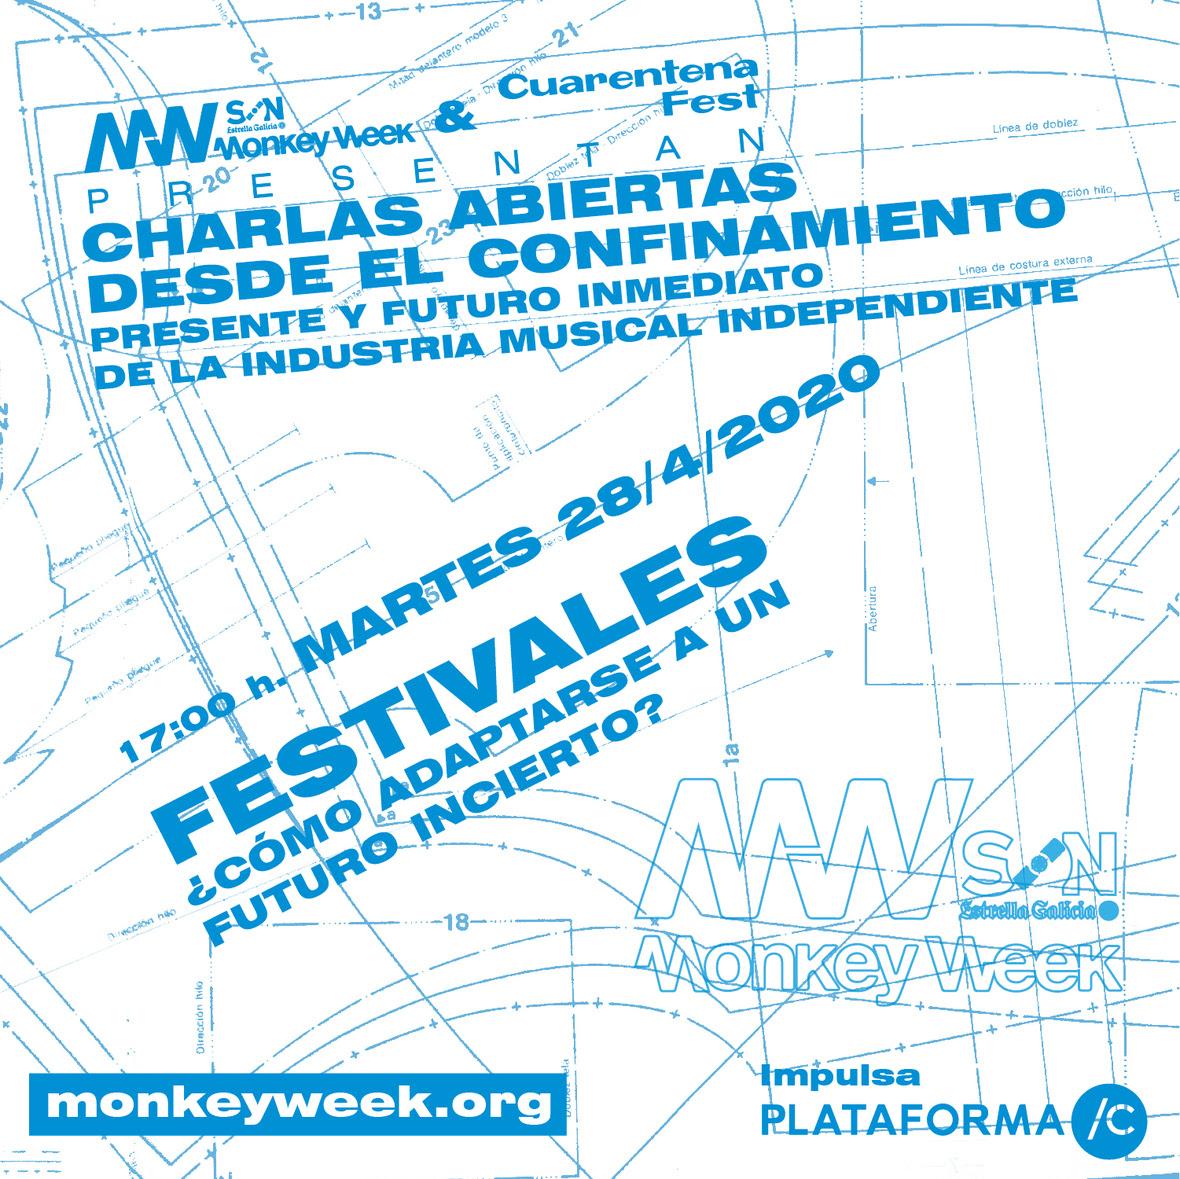 coronacharlas festivales